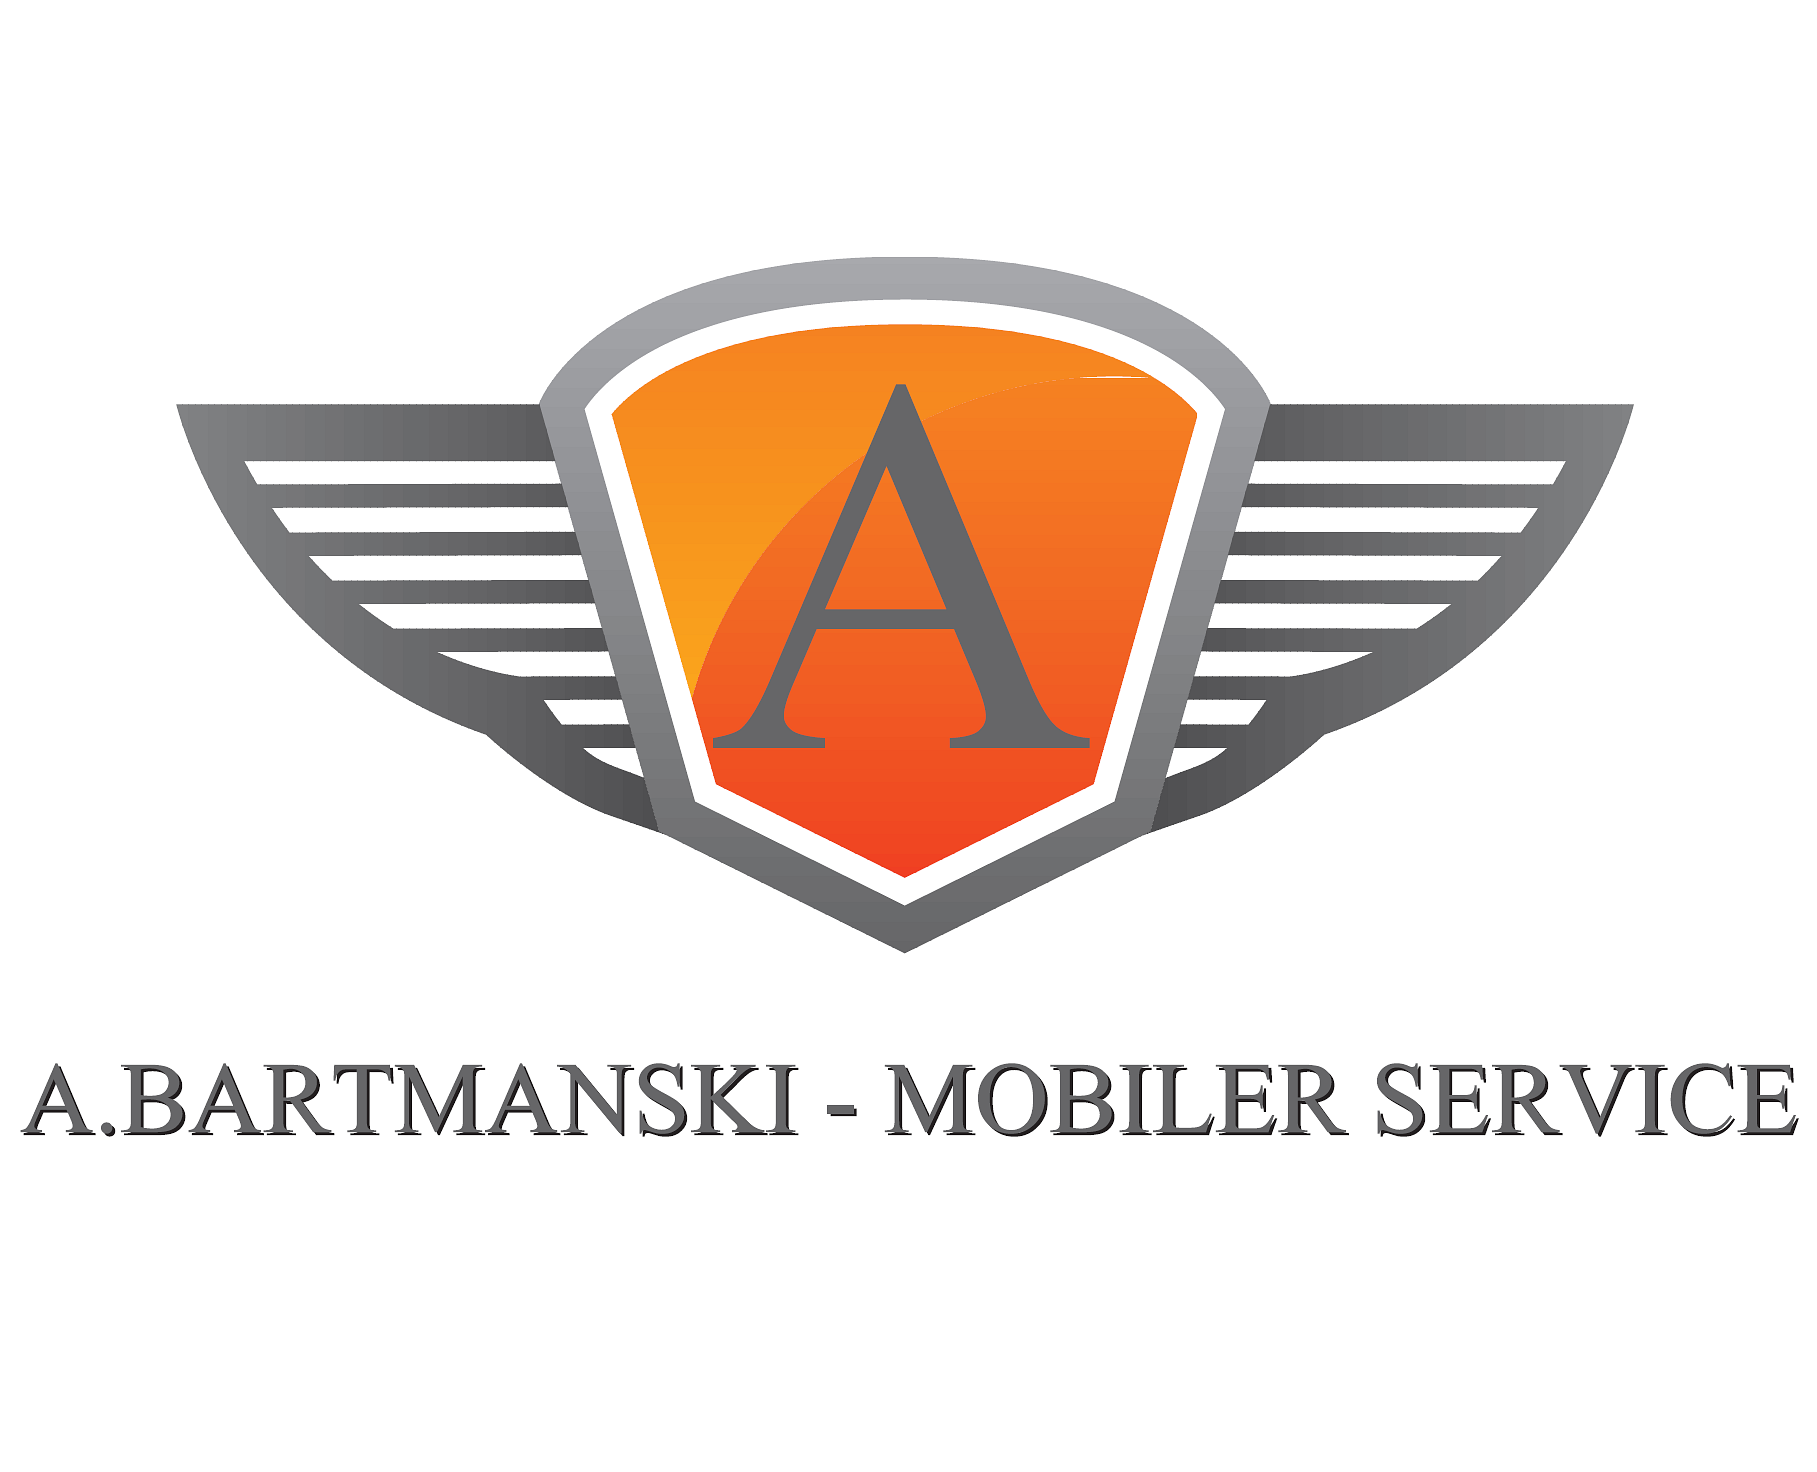 A. Bartmanski Mobiler Service